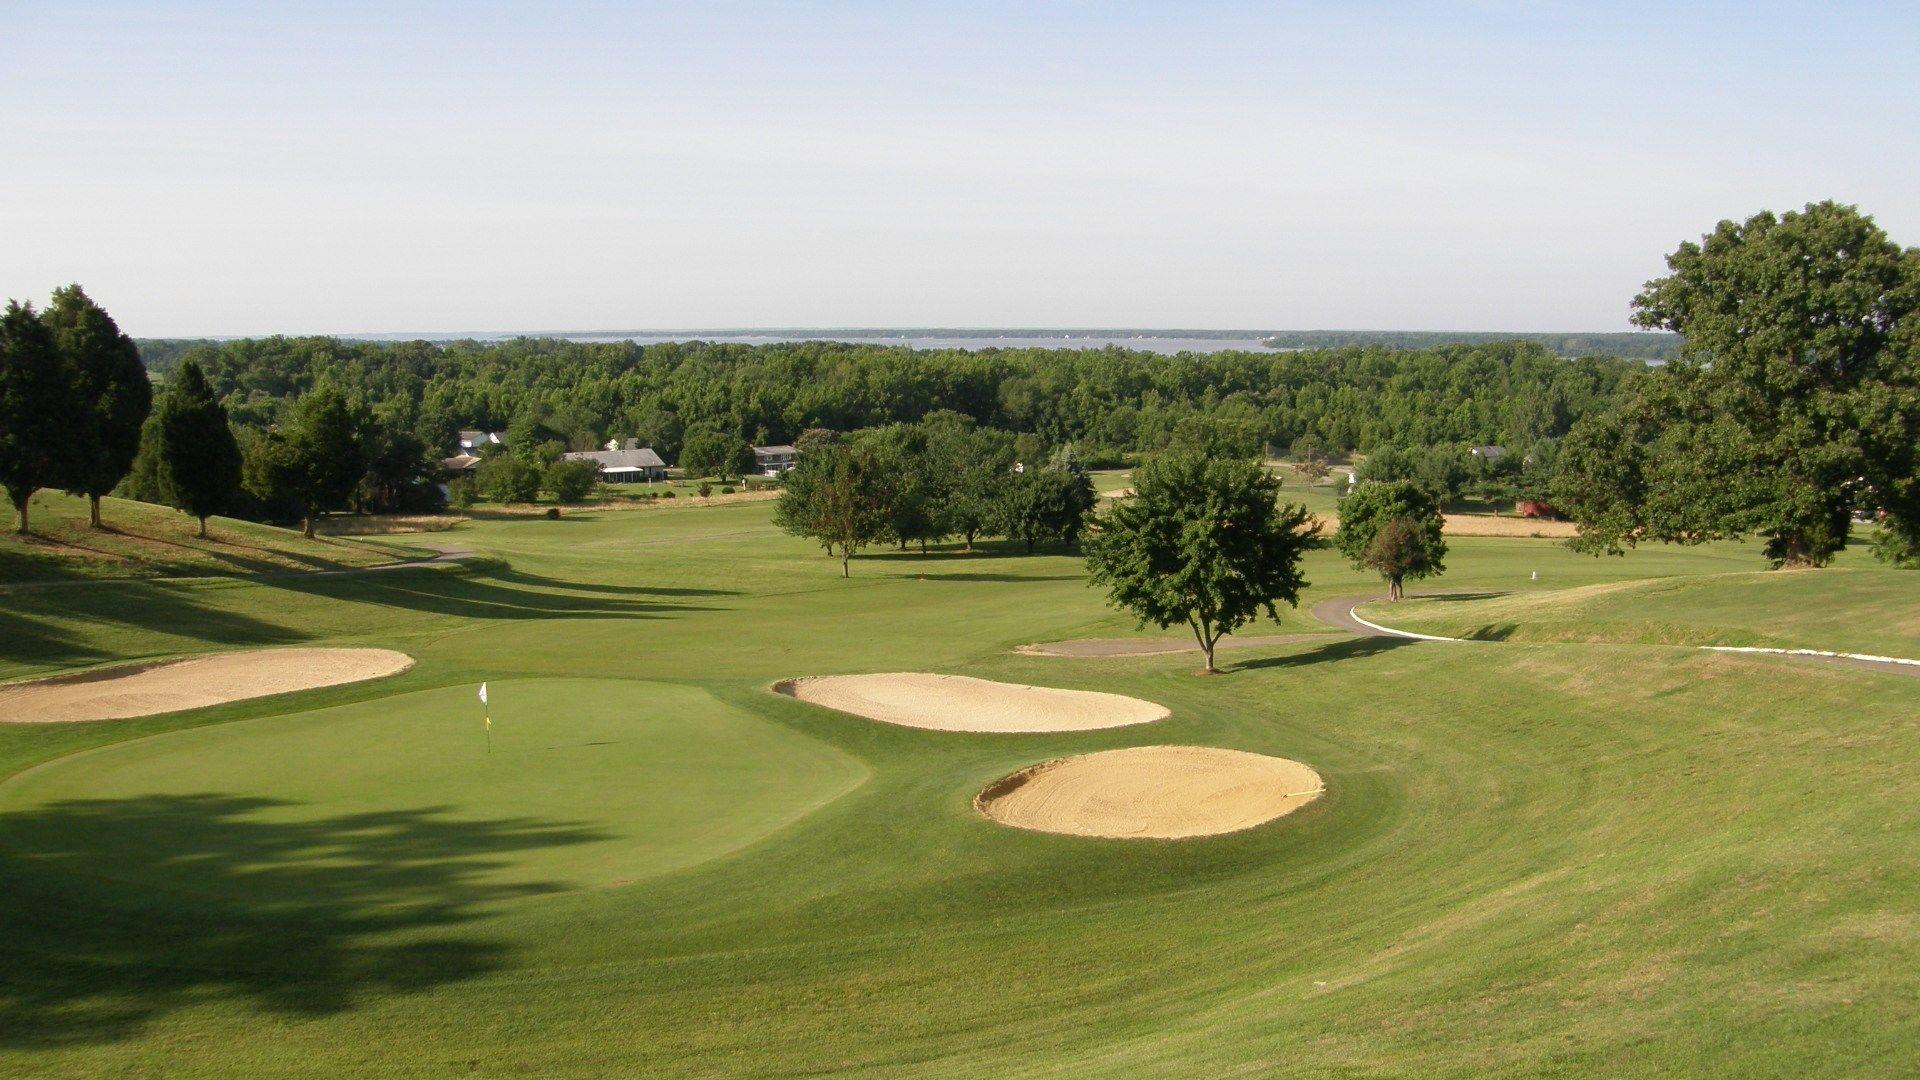 Golf Wallpaper Desktop Backgrounds Free Golf Courses Golf Backgrounds Free